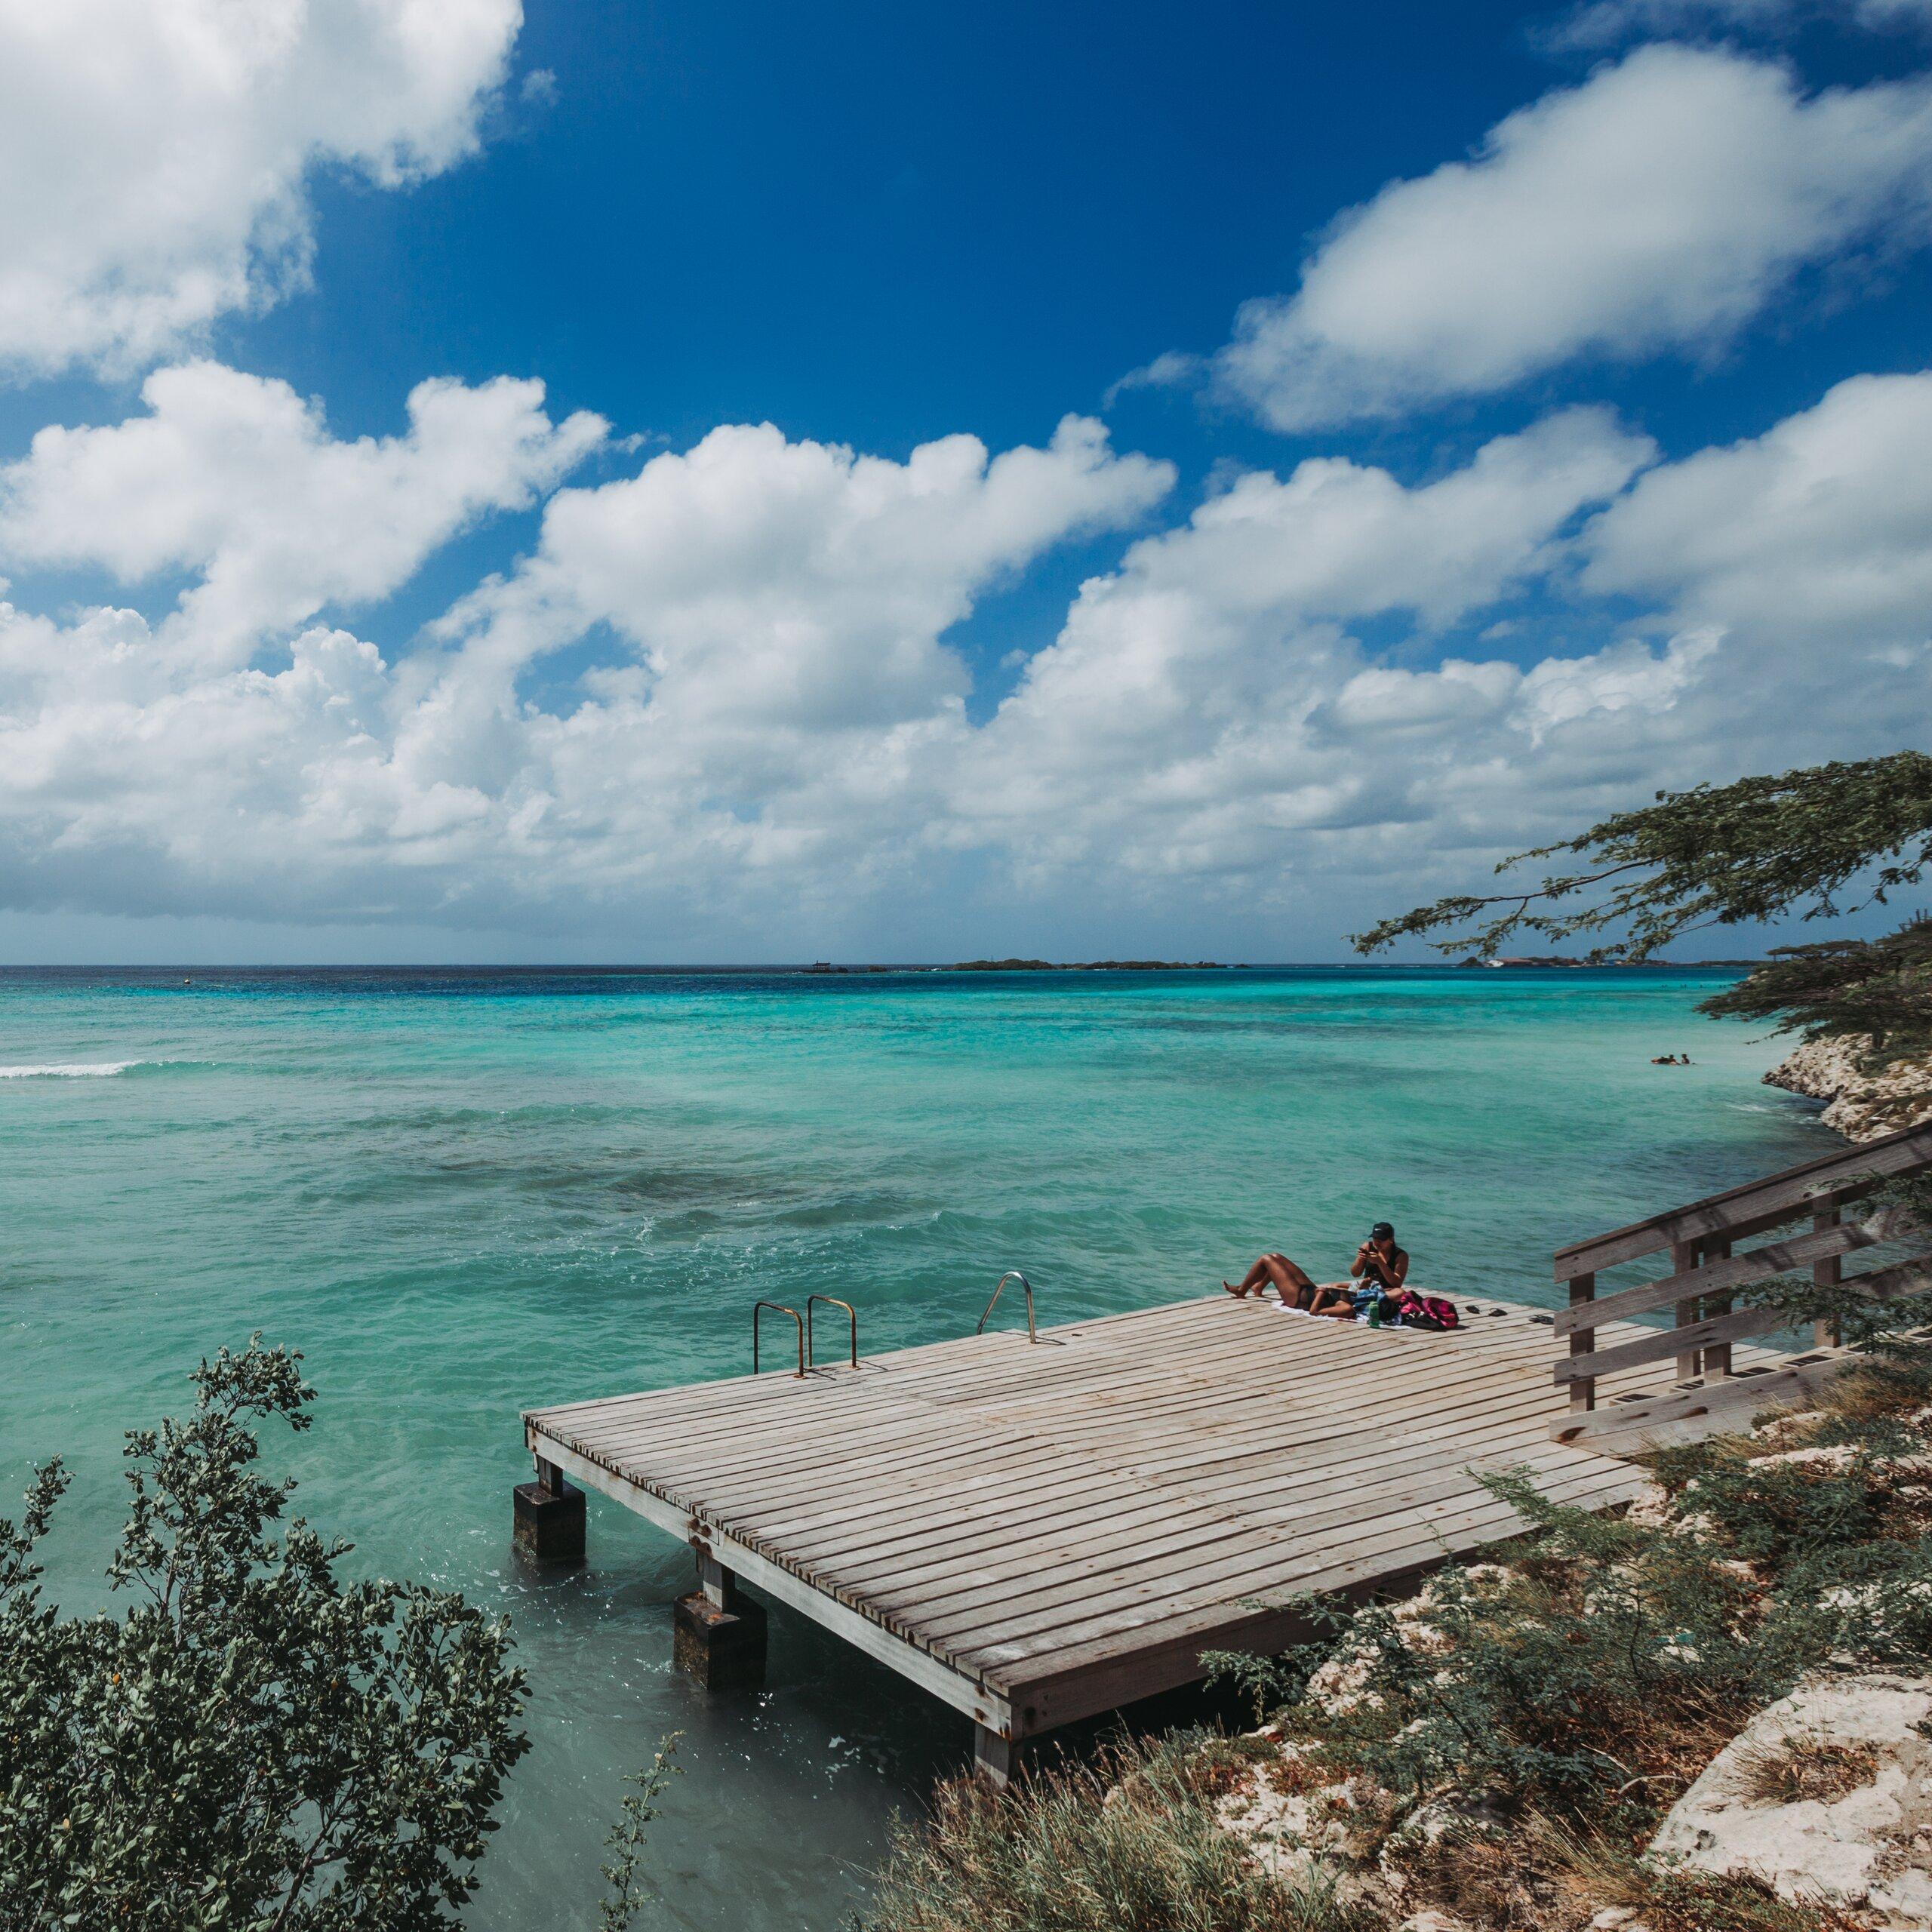 Mangel Halto Beach, Aruba - Excellent Snorkeling & Shore Diving